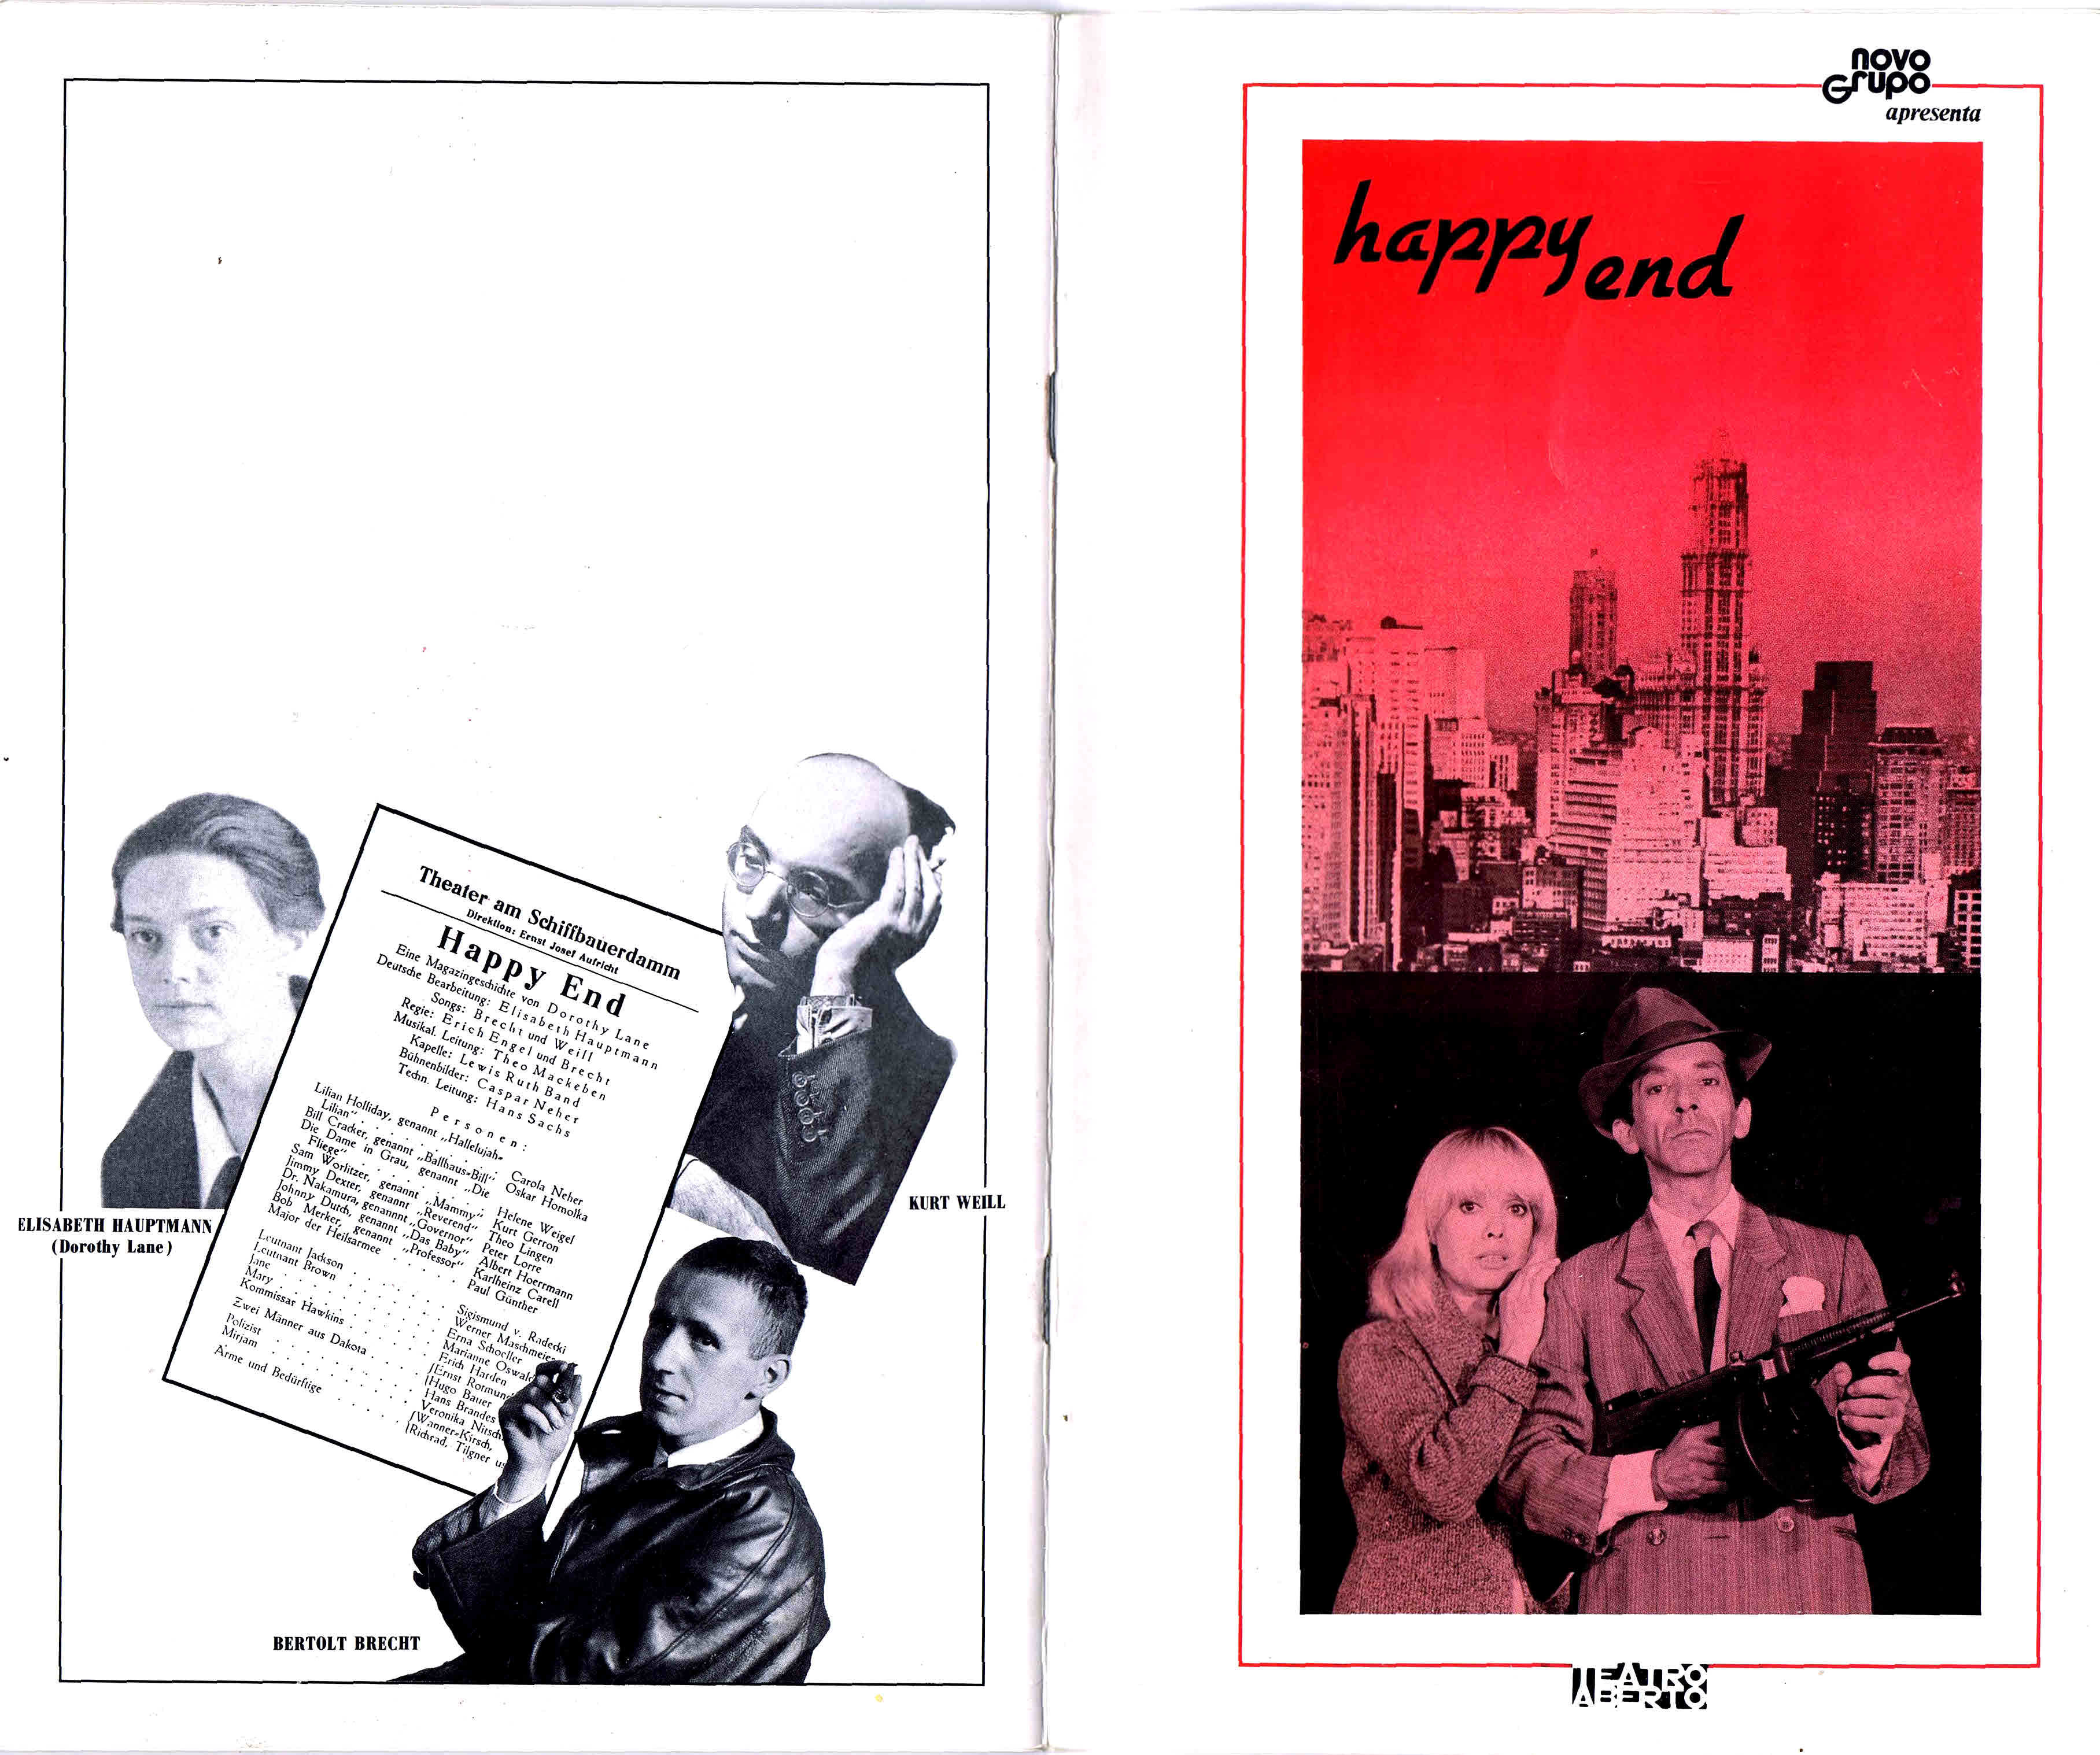 Copy of teatro novo grupo outubro 89 1